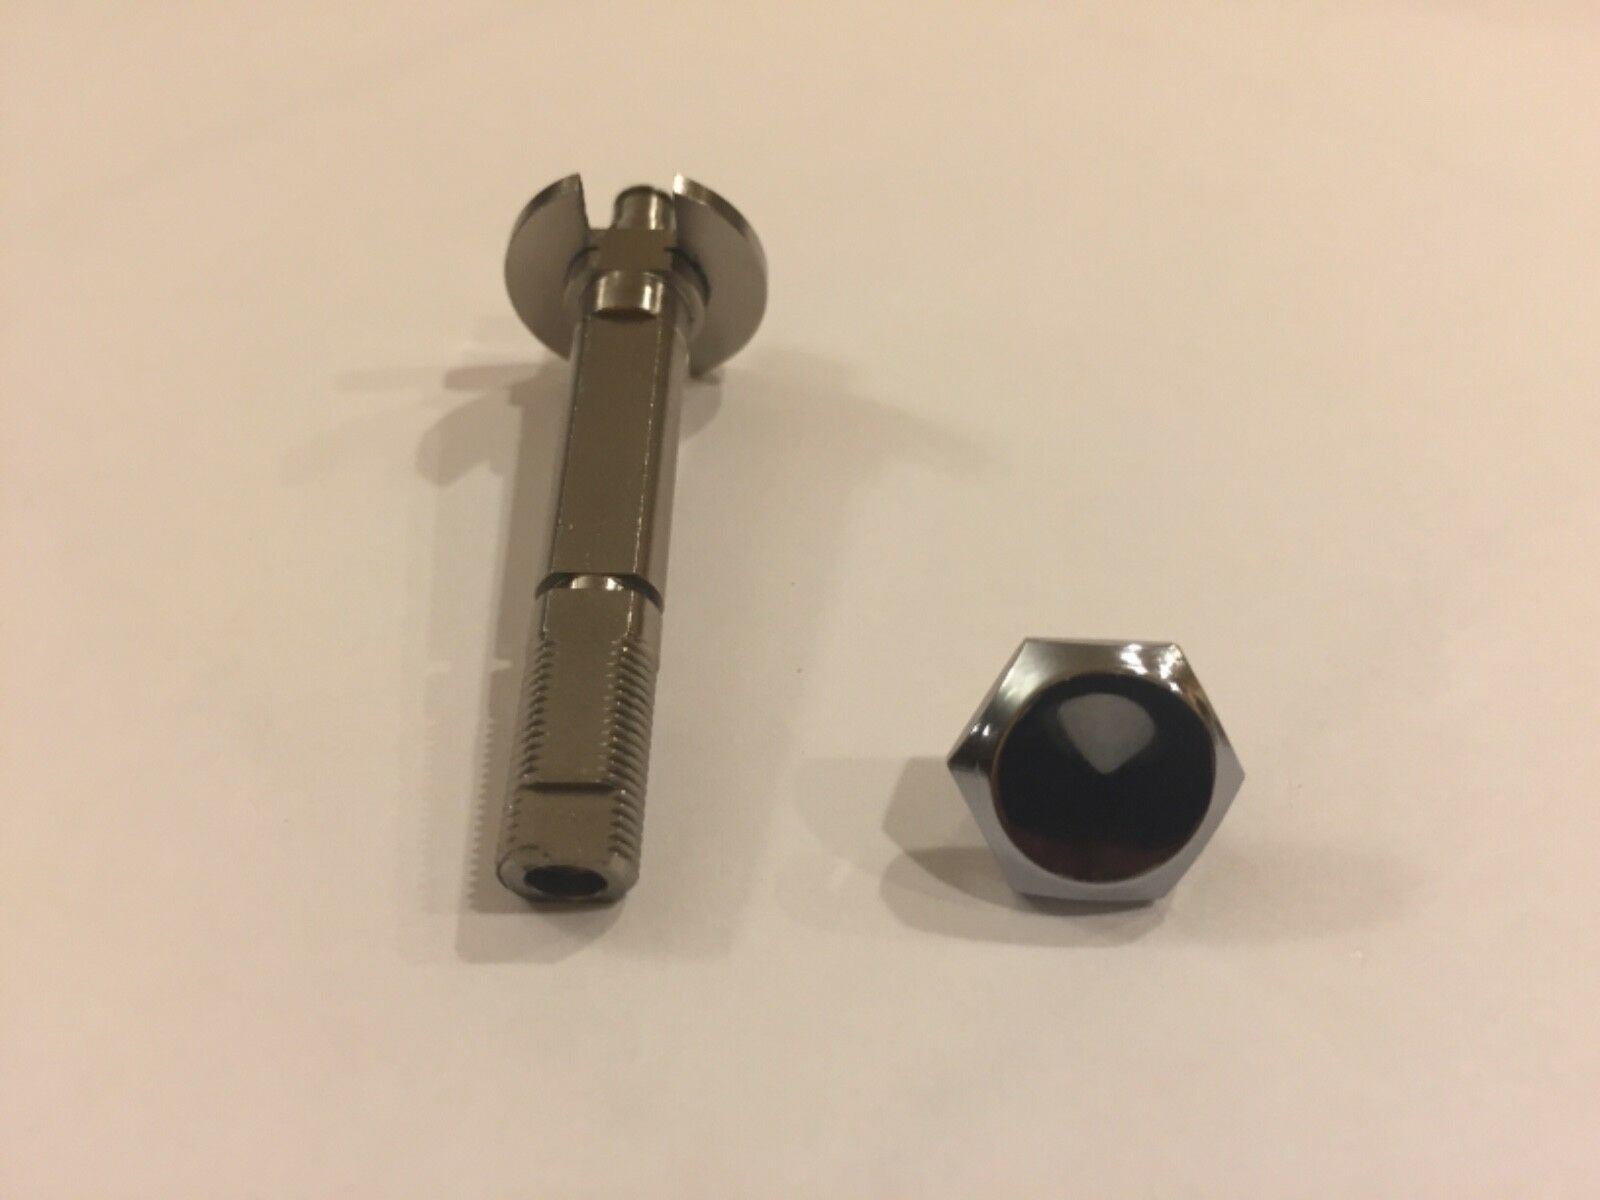 Daiwa Saltiga 35N 35NH 35N-SJ gear shaft  and handle screw original JDM  save up to 70%